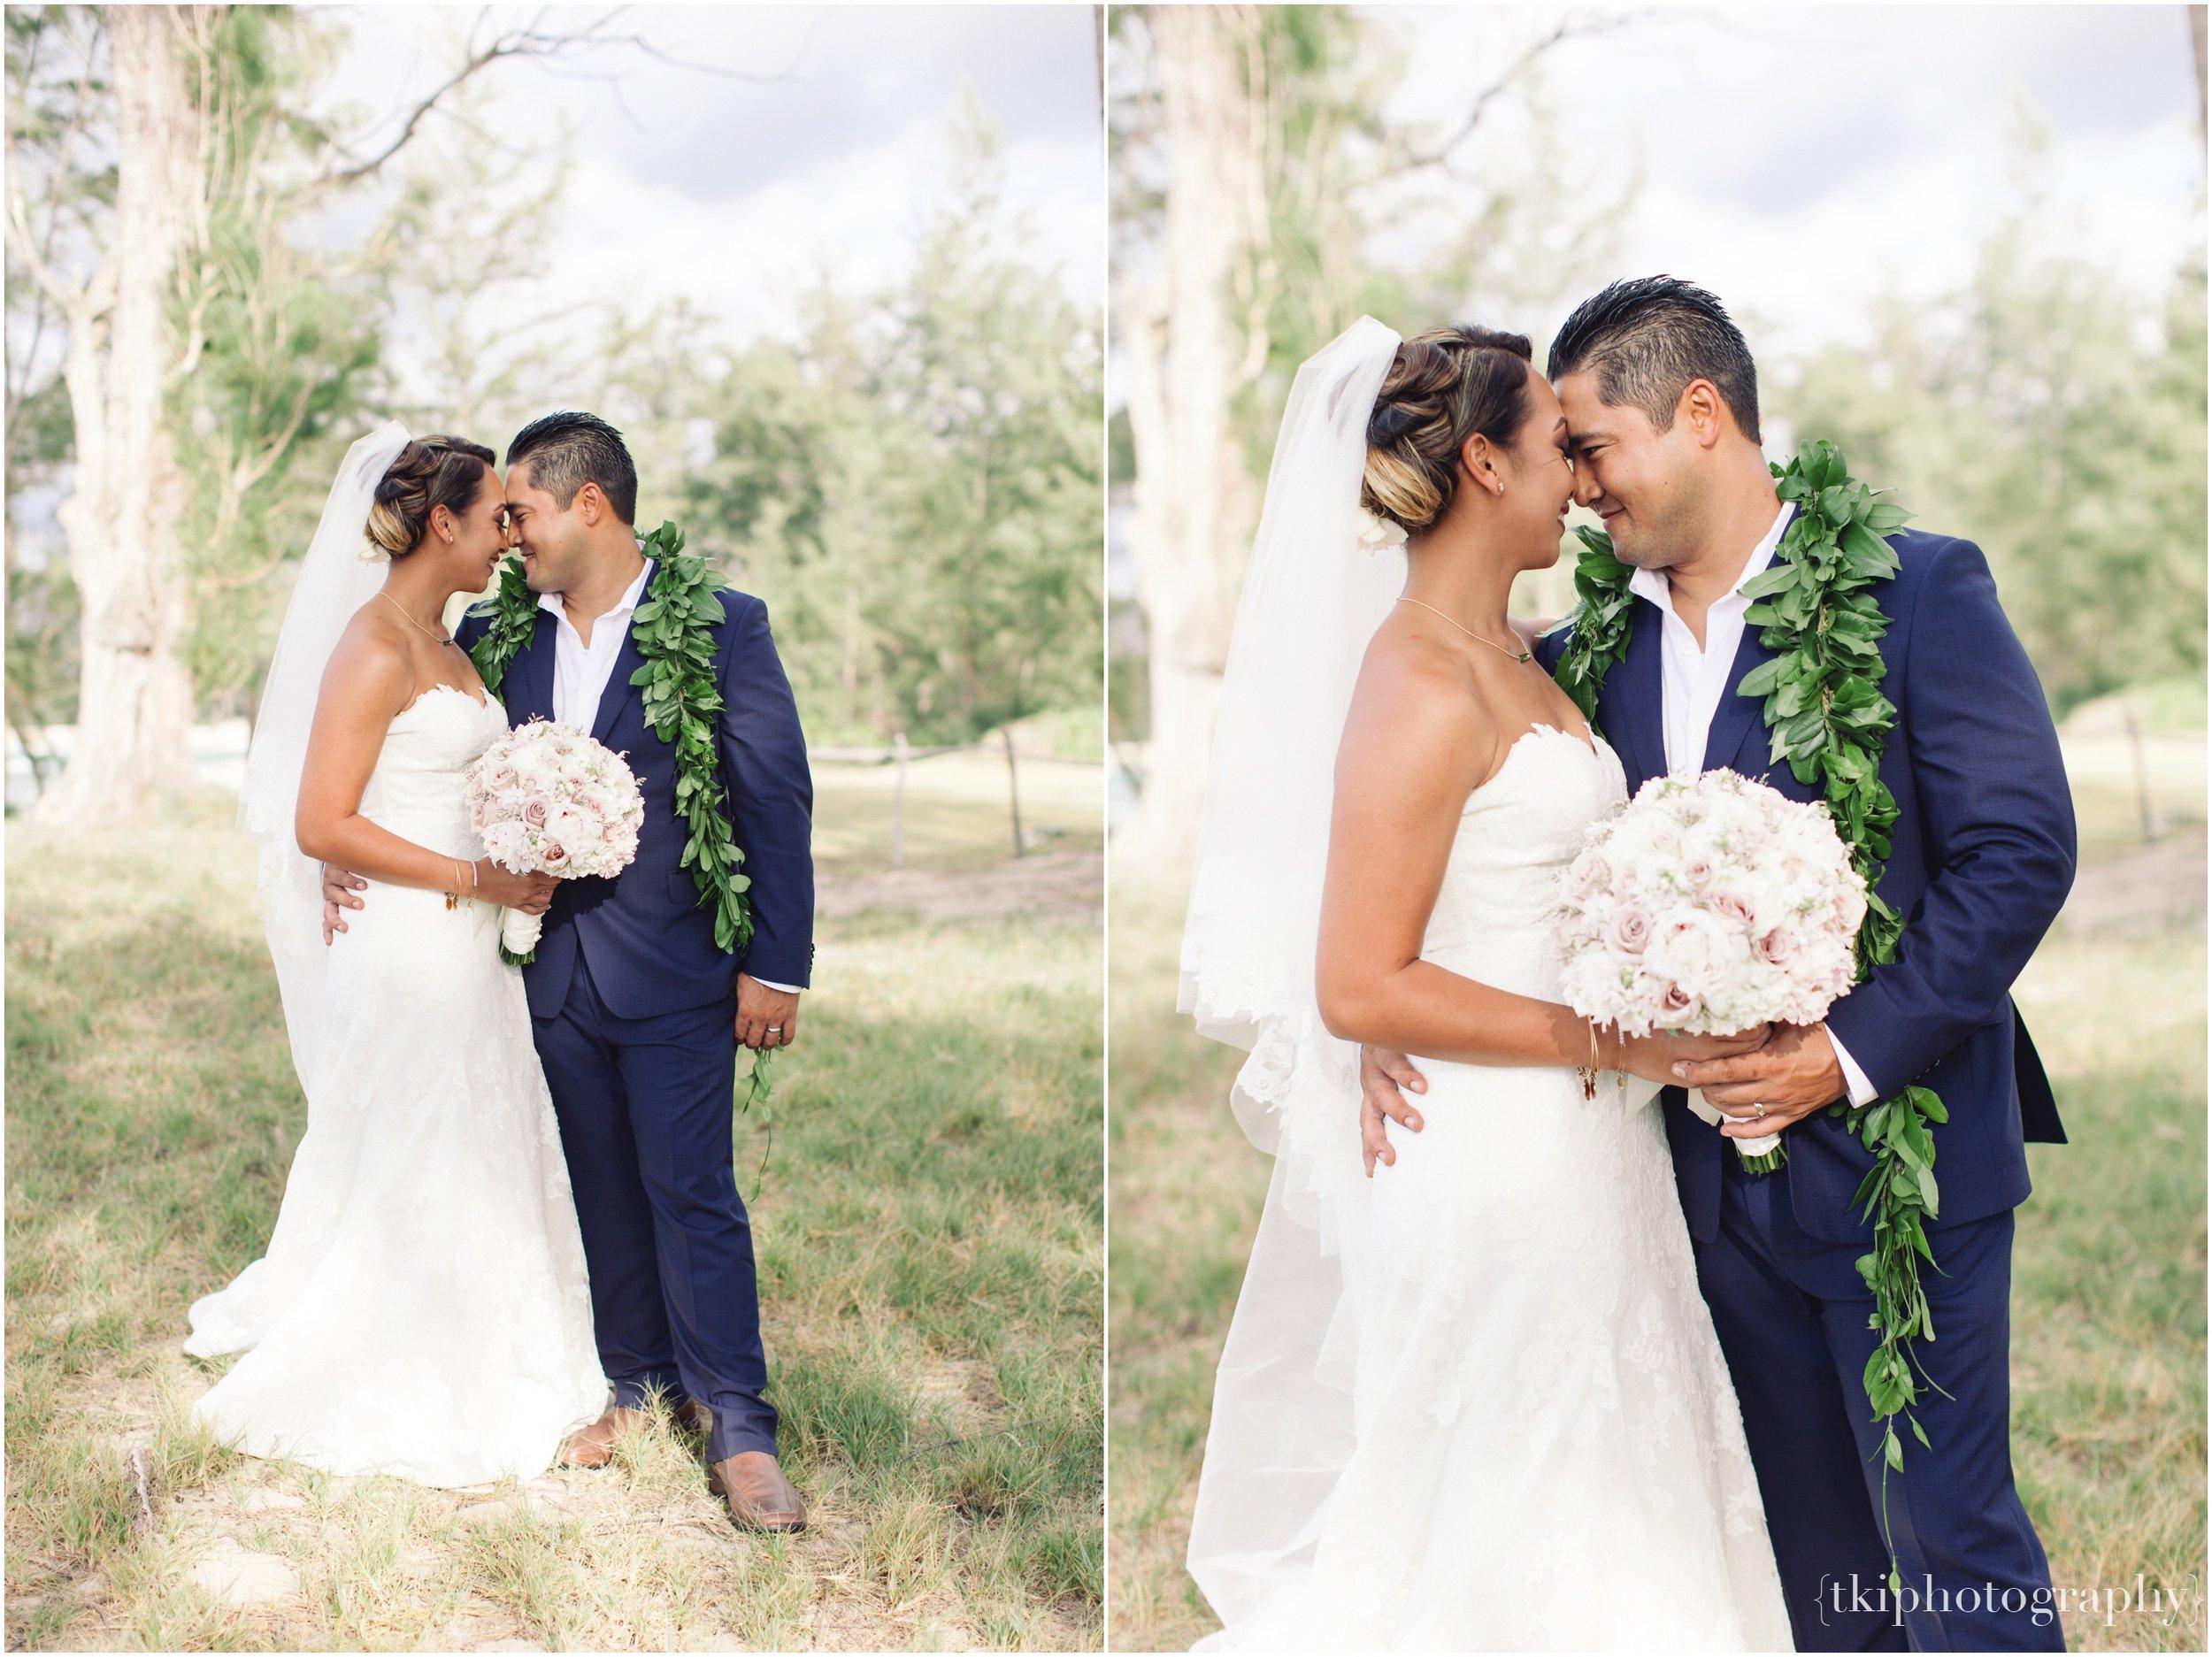 Oahu-Destination-Wedding-Beach_0100.jpg